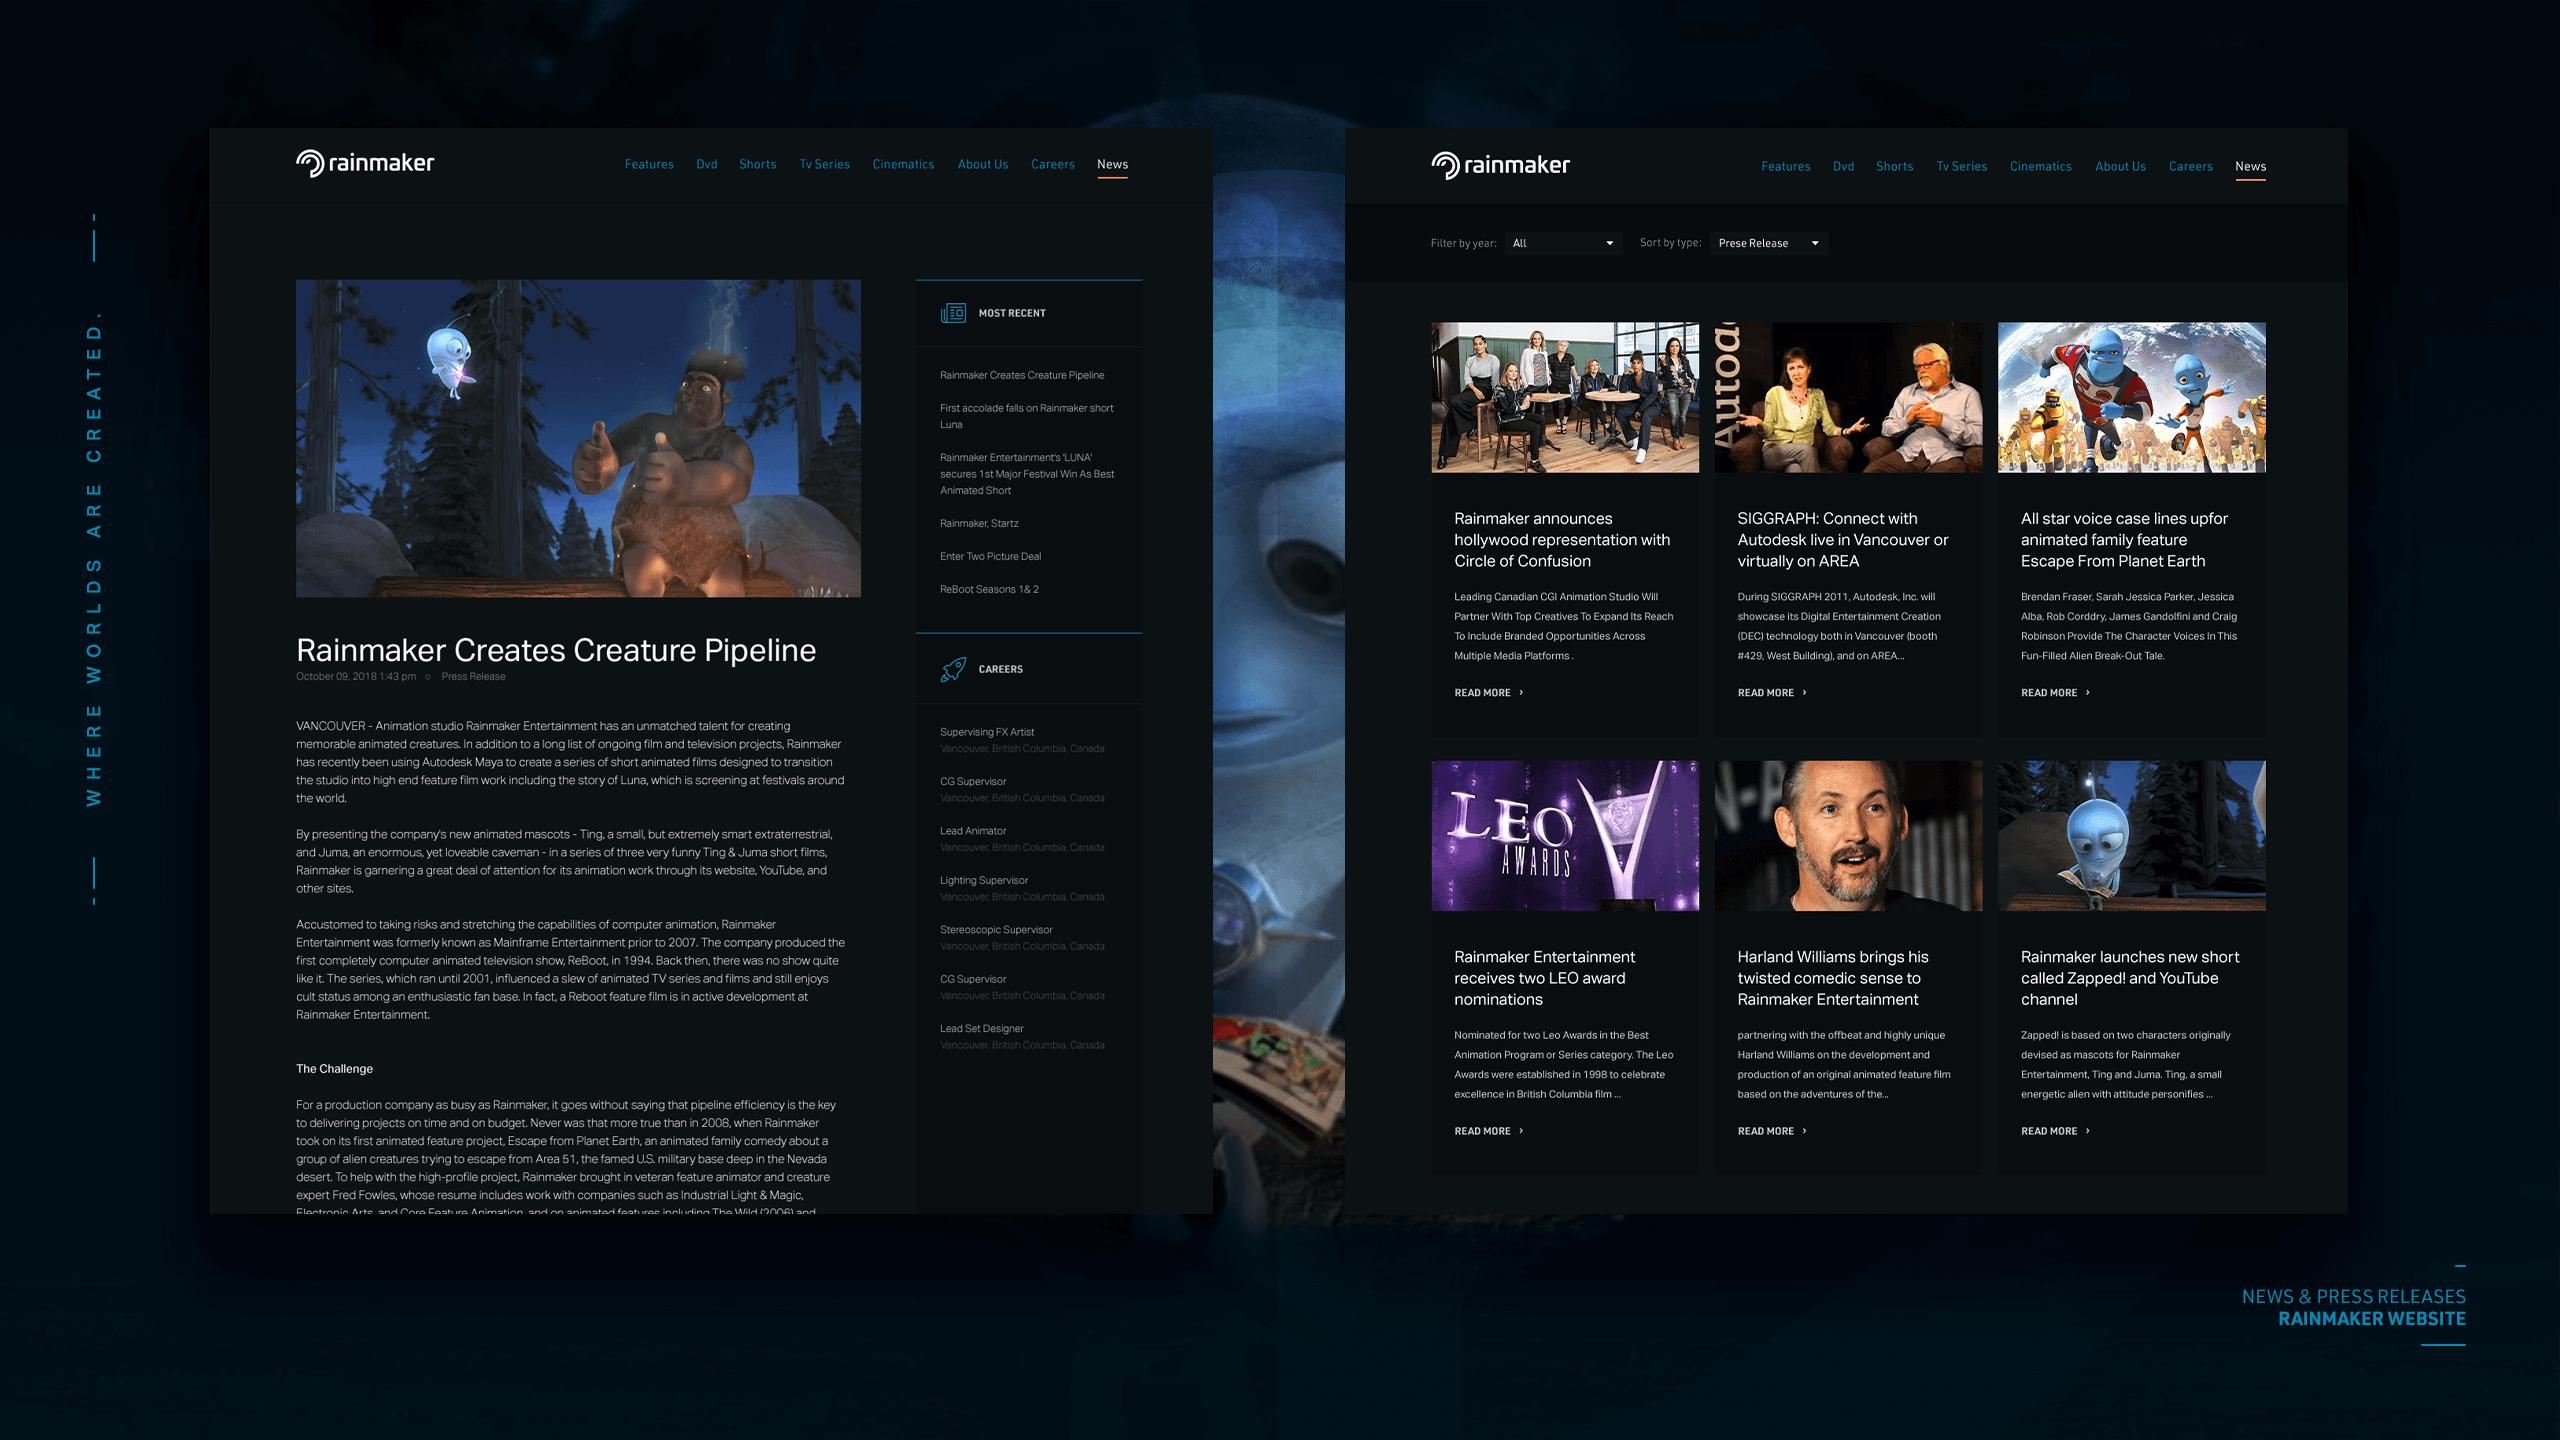 rainmaker-website-desktop-news